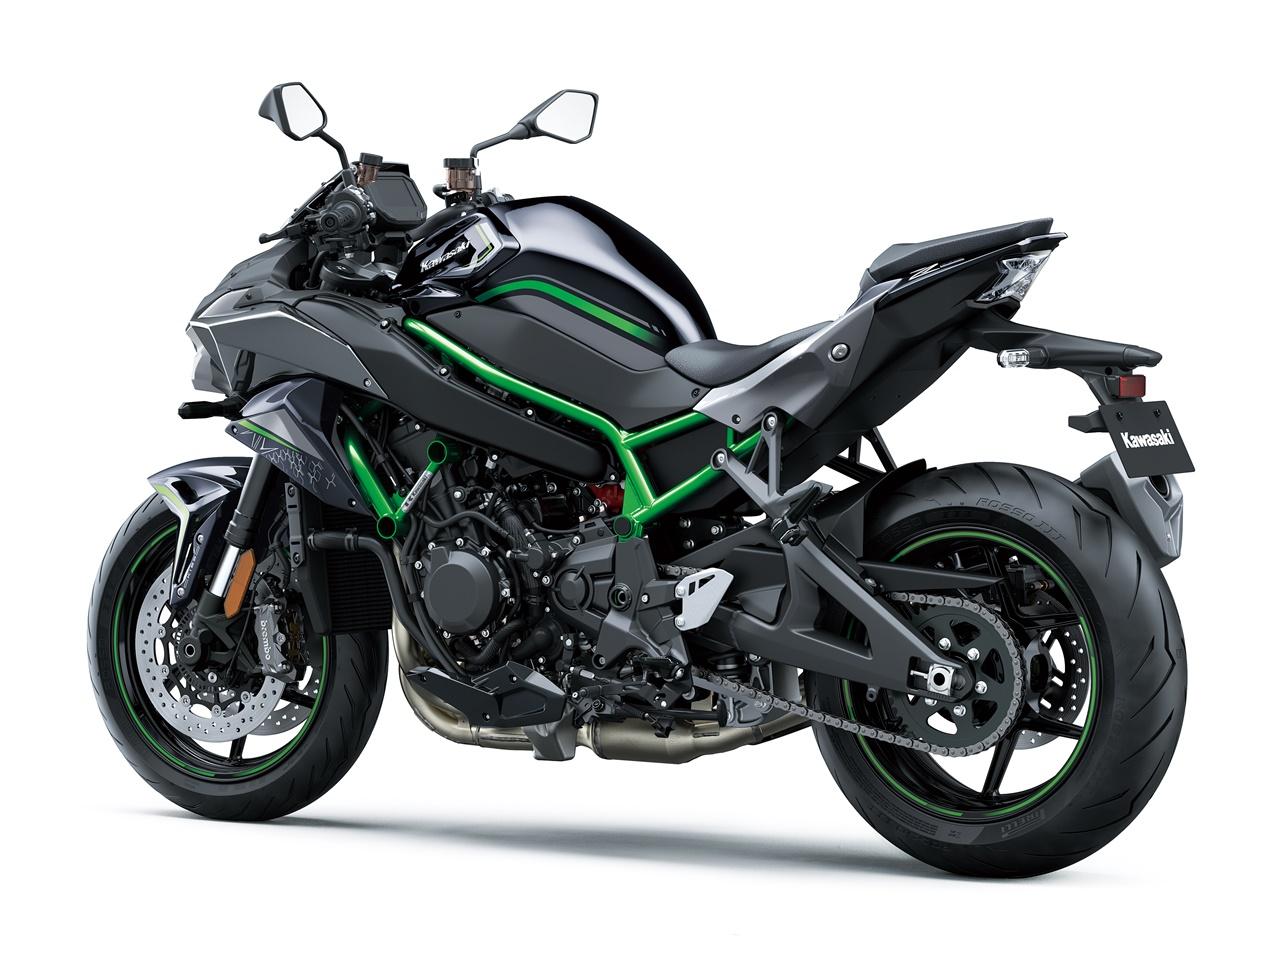 Kawasaki Z H2 2020: Hypernaked a la máxima potencia - foto 9